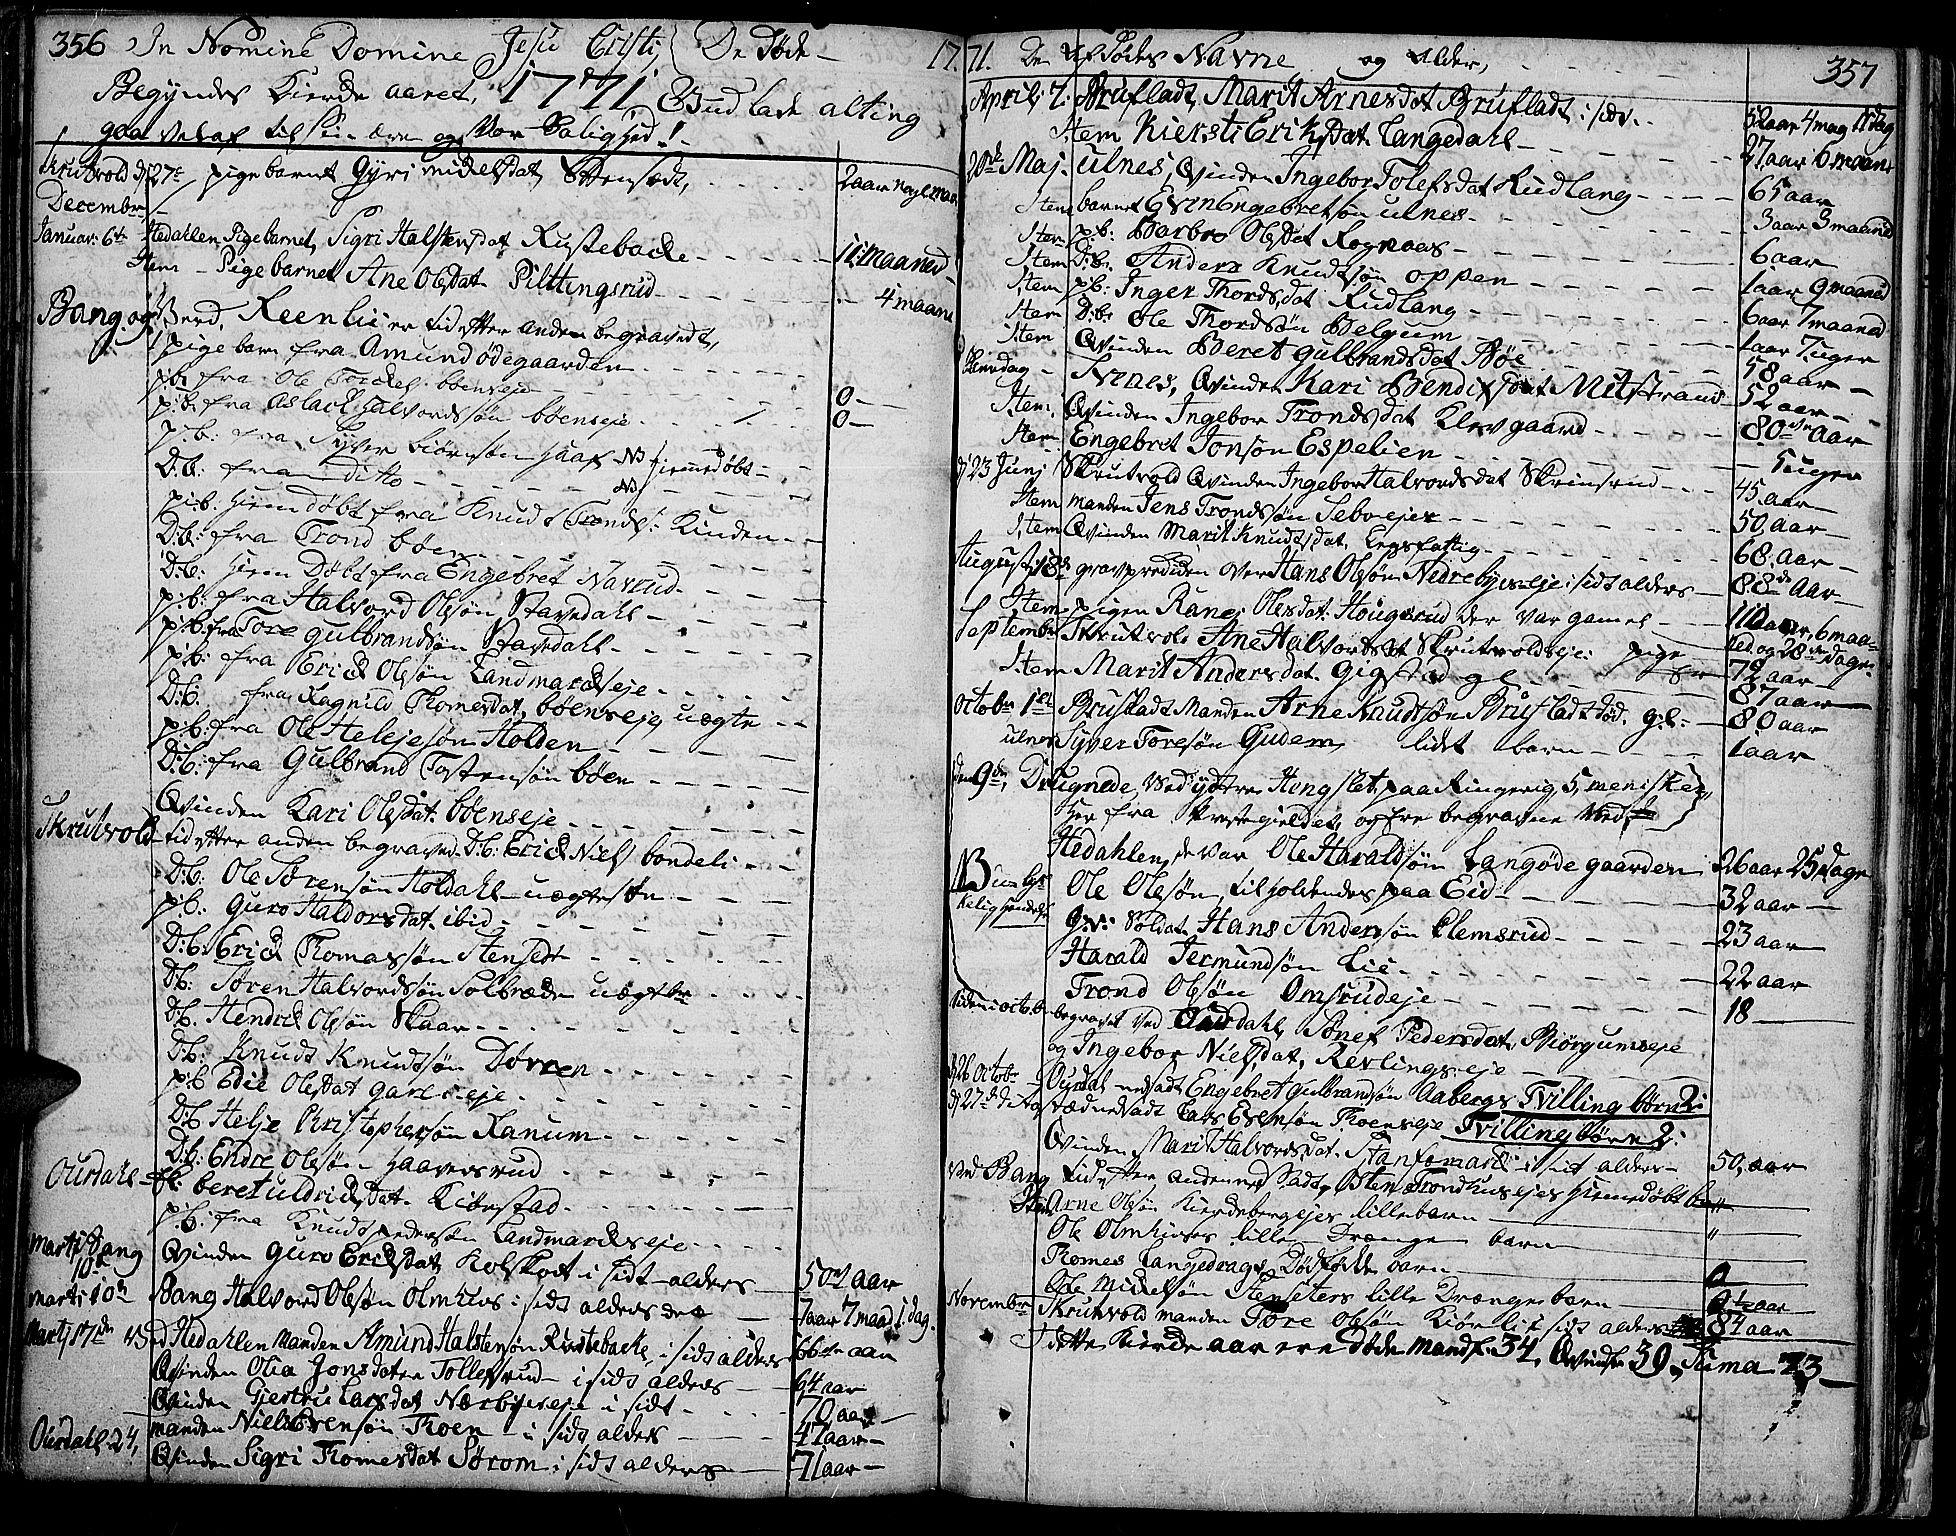 SAH, Aurdal prestekontor, Ministerialbok nr. 5, 1763-1781, s. 356-357